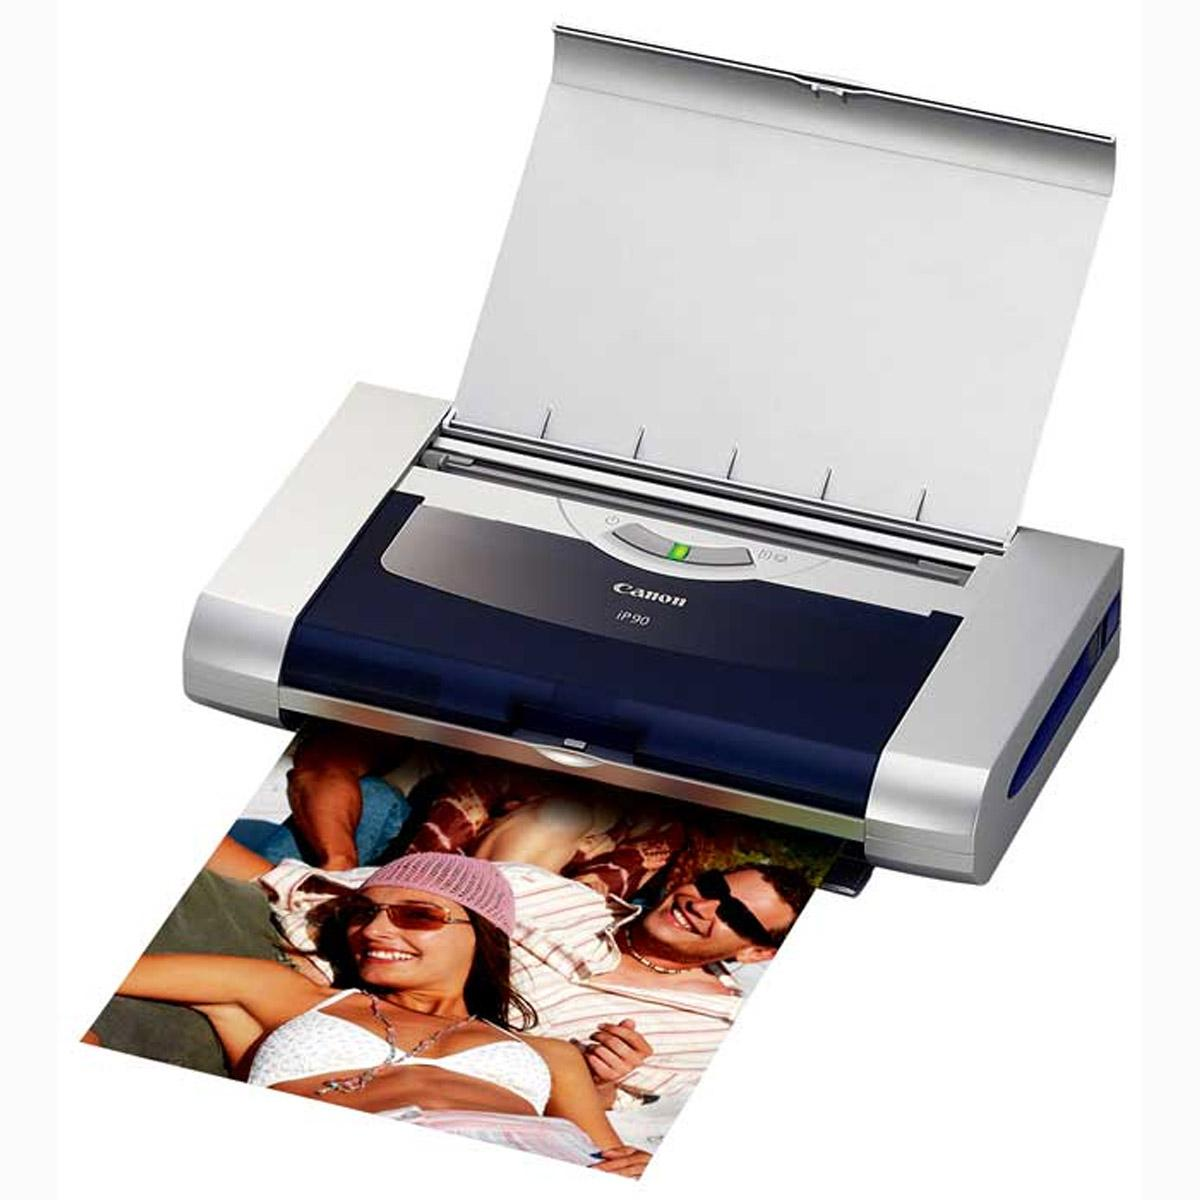 Canon pixma ip90 inkjet photo printer